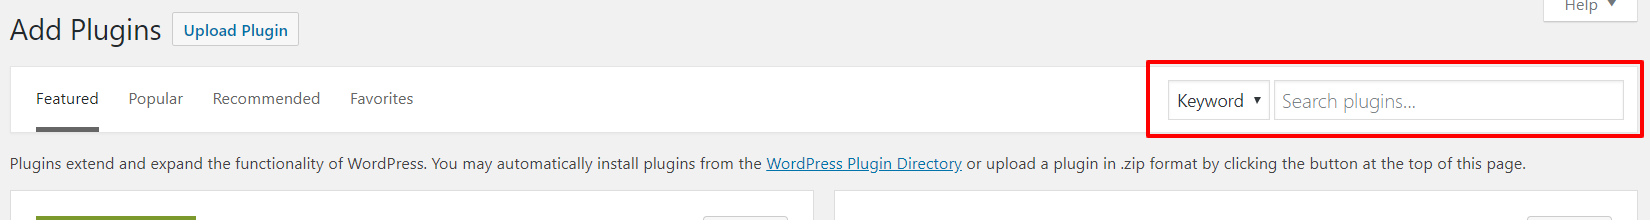 WordPress dashboard add new plugin search toolbar screenshot